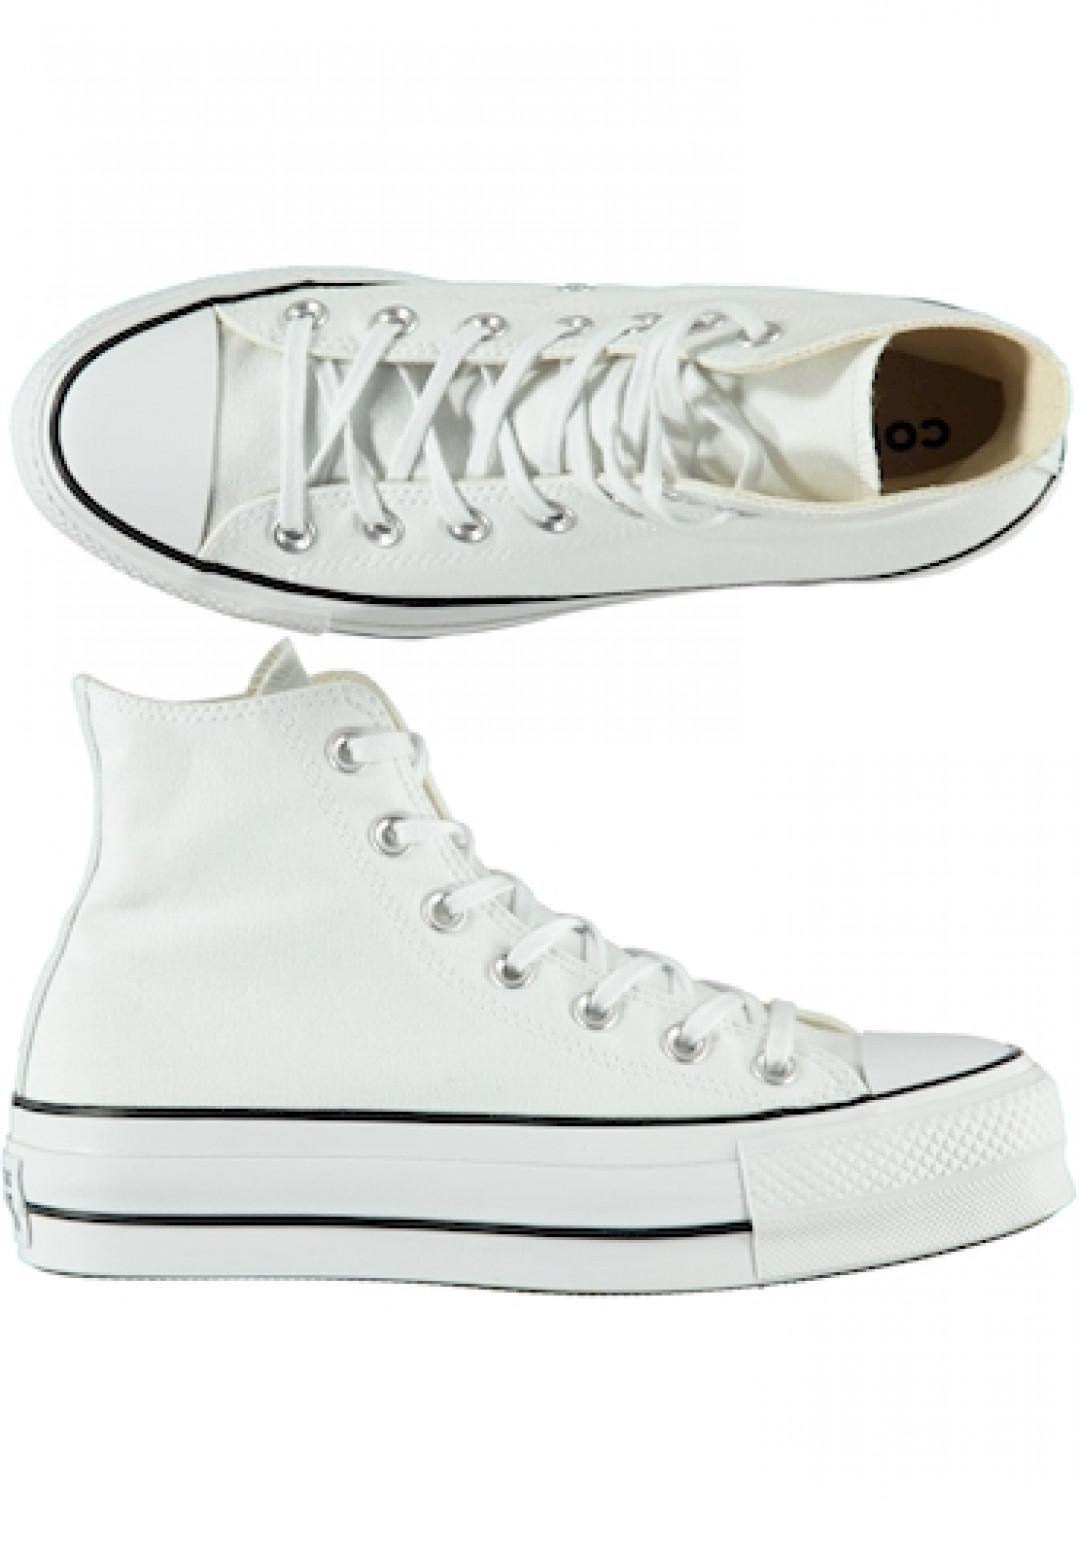 nico scarpe converse